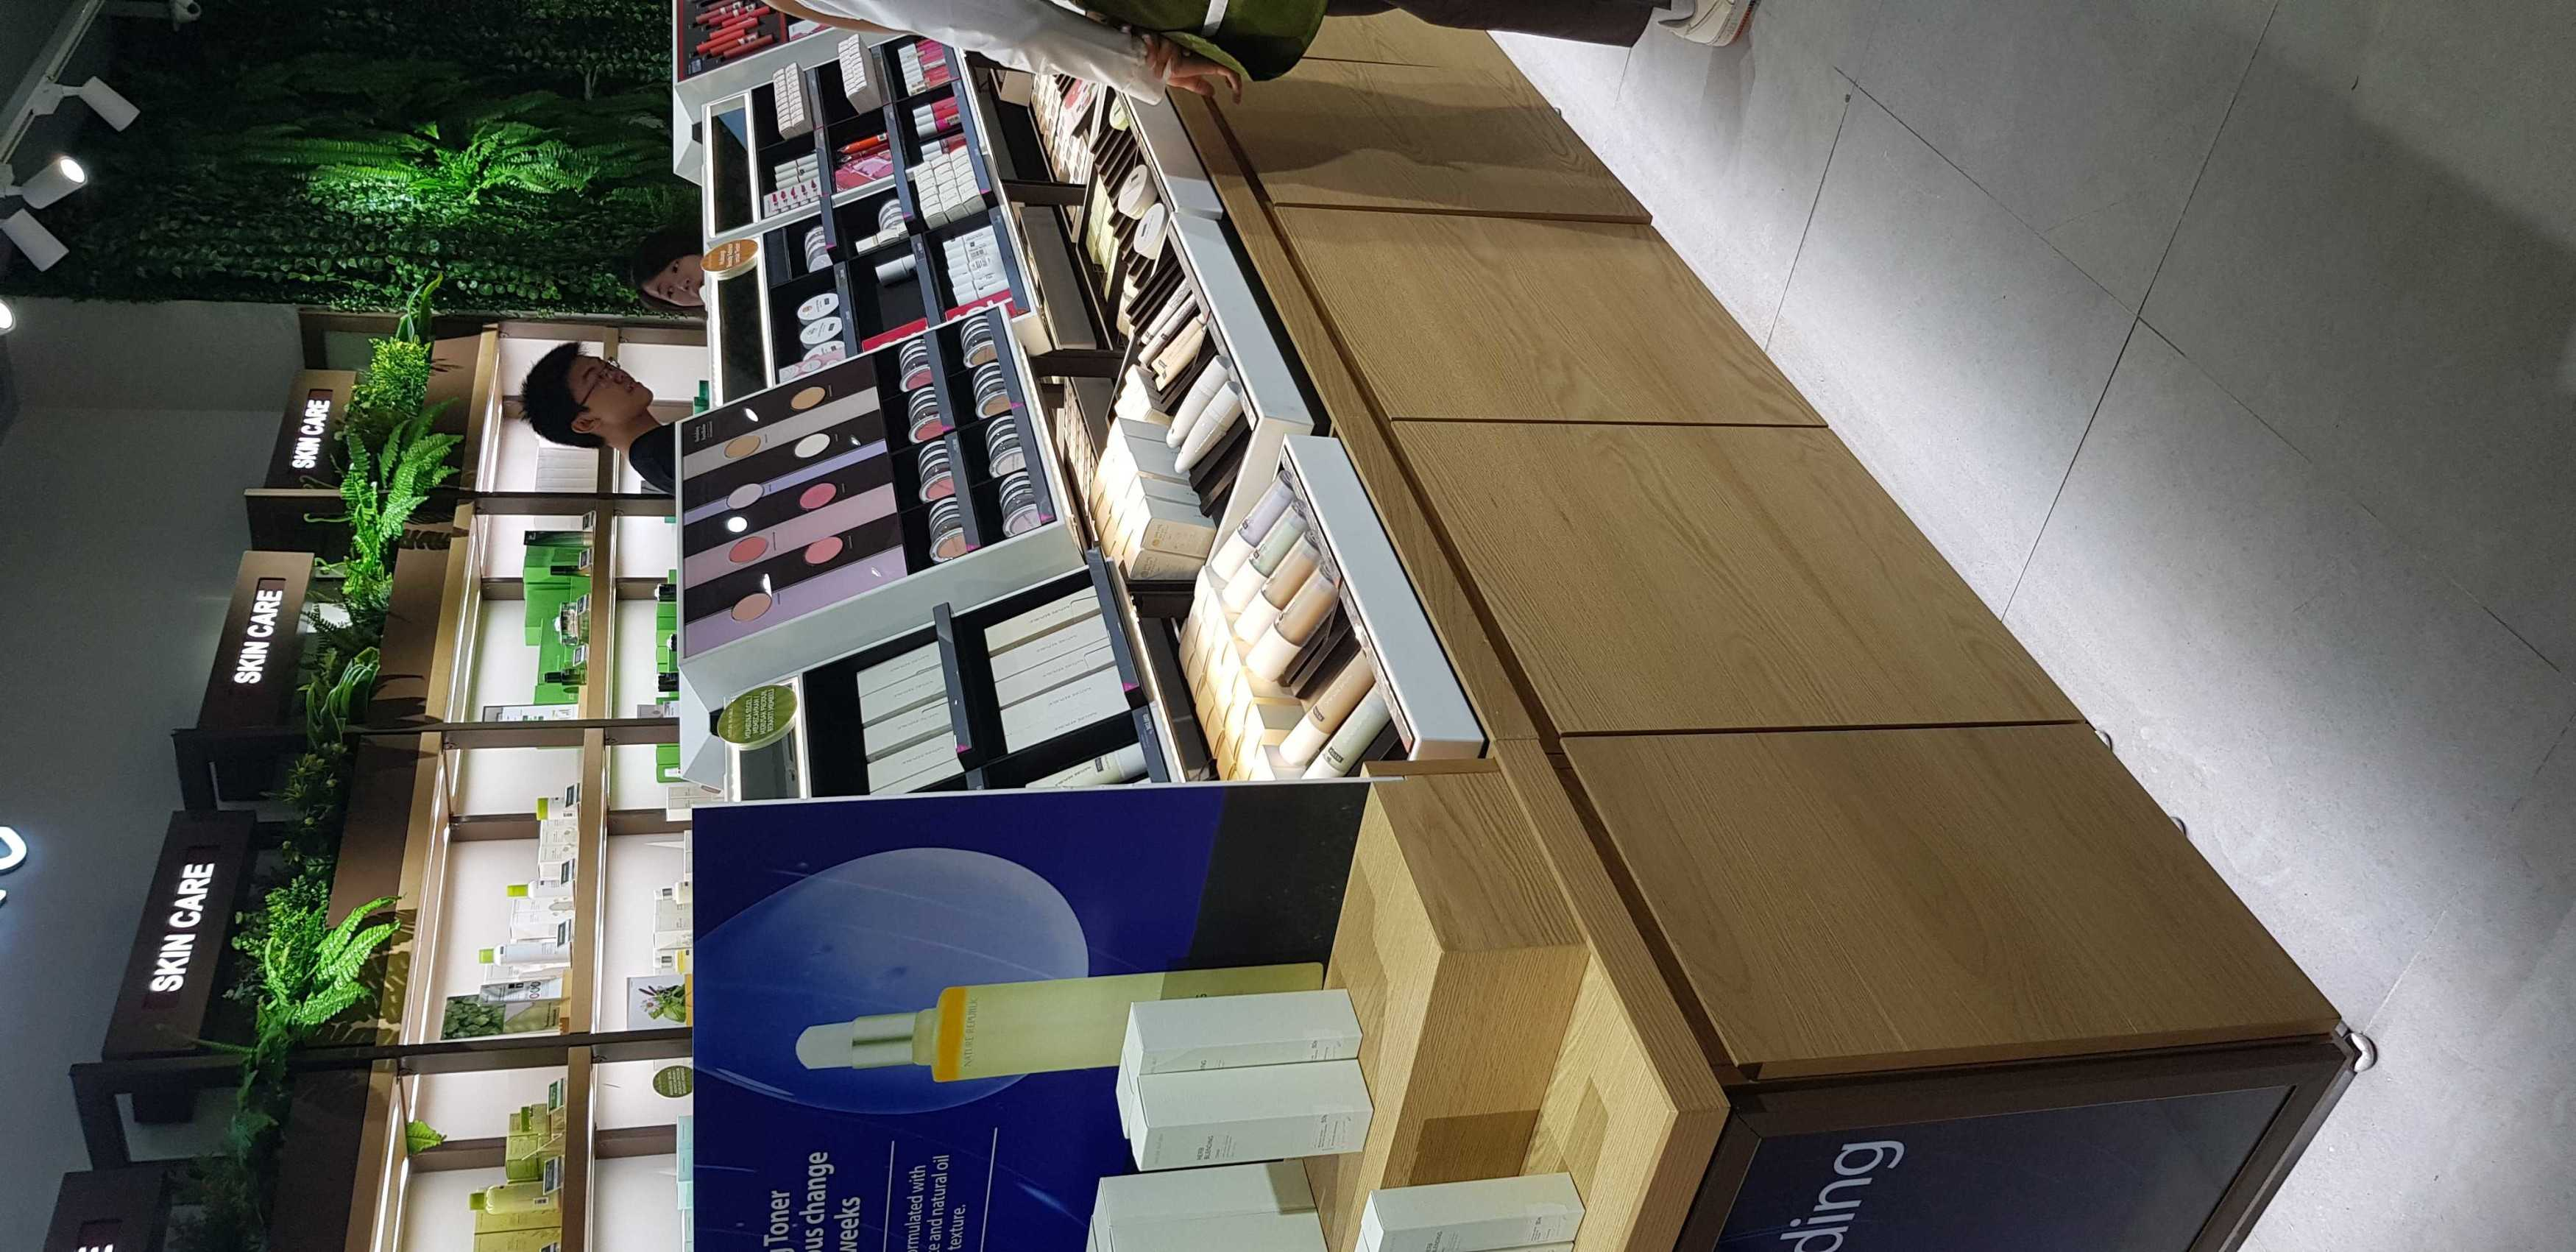 Shiraz Design Nature Republic Retail Store Project (Serpong Branch) Sumarecon Mall Serpong, Jl. Gading Serpong Boulevard No.238, Pakulonan Bar., Kec. Klp. Dua, Tangerang, Banten 15810, Indonesia Sumarecon Mall Serpong, Jl. Gading Serpong Boulevard No.238, Pakulonan Bar., Kec. Klp. Dua, Tangerang, Banten 15810, Indonesia Shiraz-Design-Nature-Republic-Retail-Store-Project-Serpong-Branch   123718